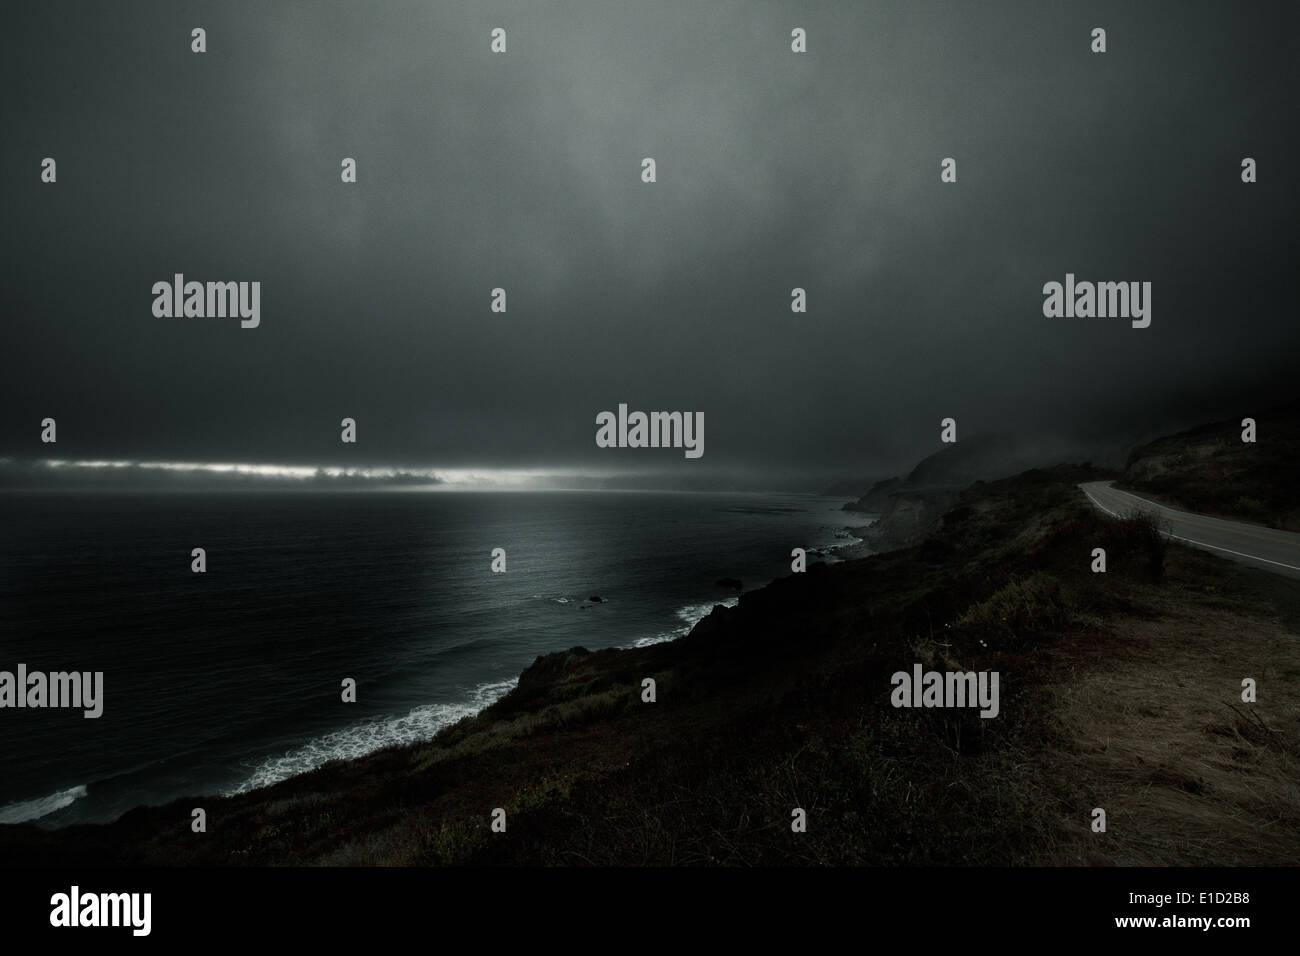 Northern California Coastline, PCH - Stock Image